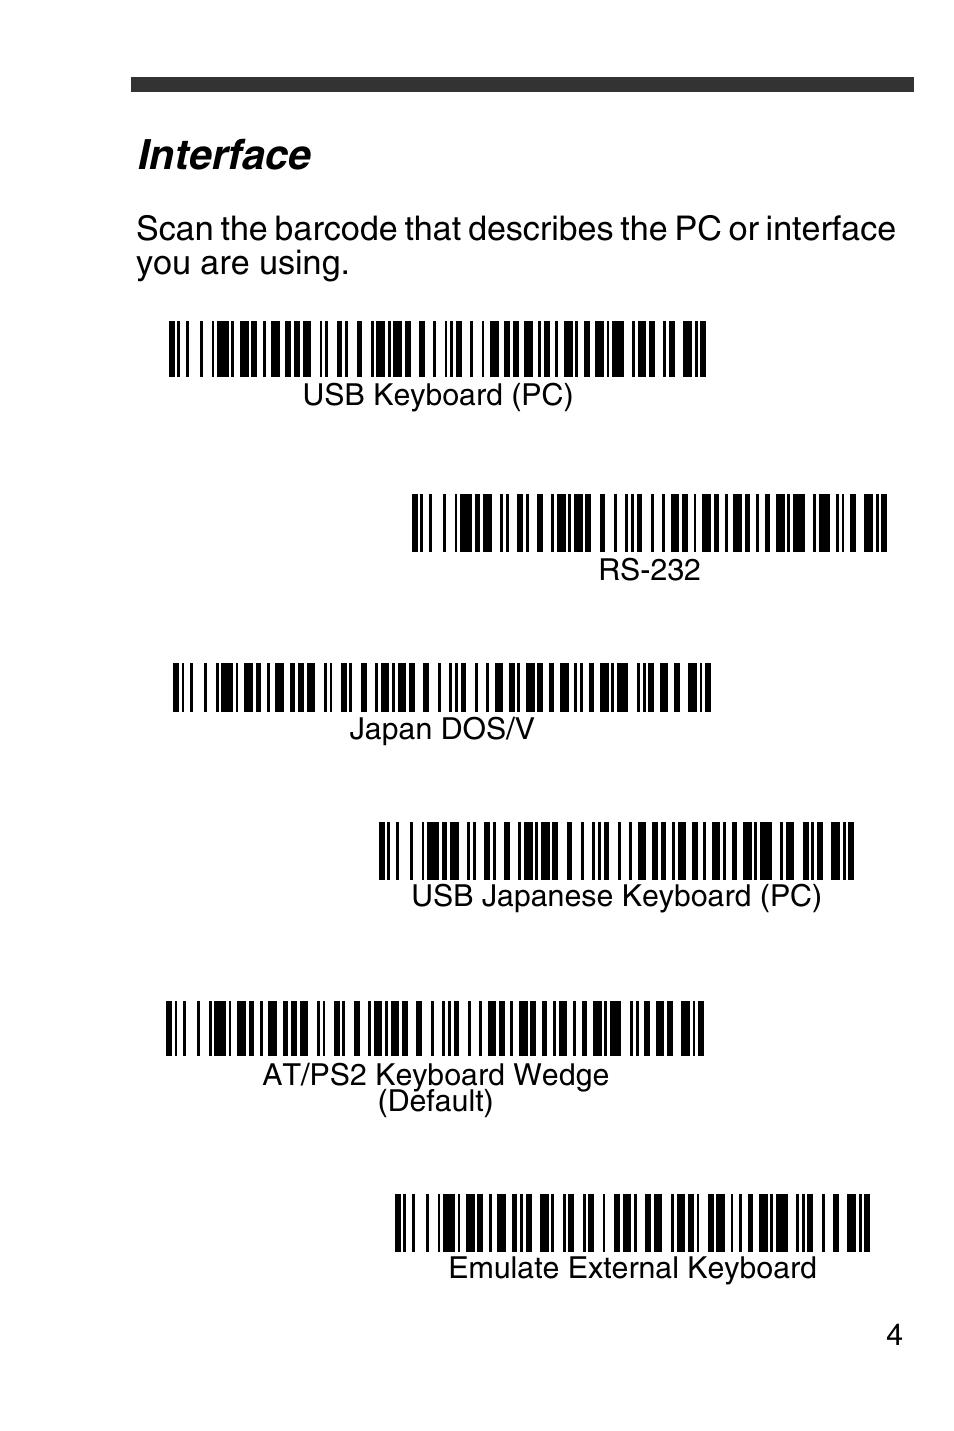 interface honeywell 4600g user manual page 5 20 rh manualsdir com Honeywell 4600G with Base honeywell barcode scanner 4600g manual